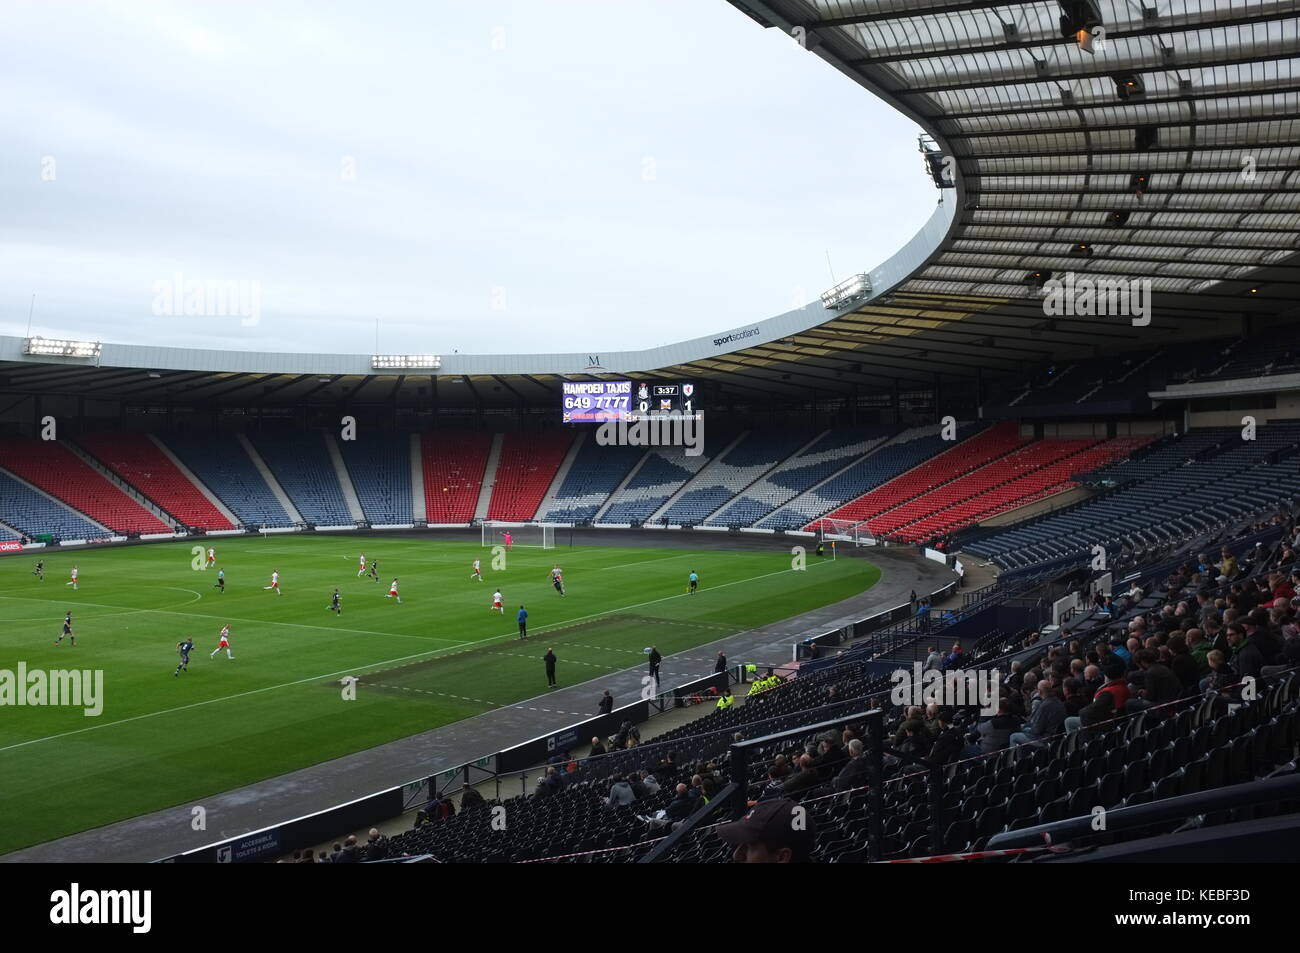 Inside Hampden Park football stadium during Queen's Park v Raith Rovers, Glasgow, Scotland, United Kingdom. - Stock Image